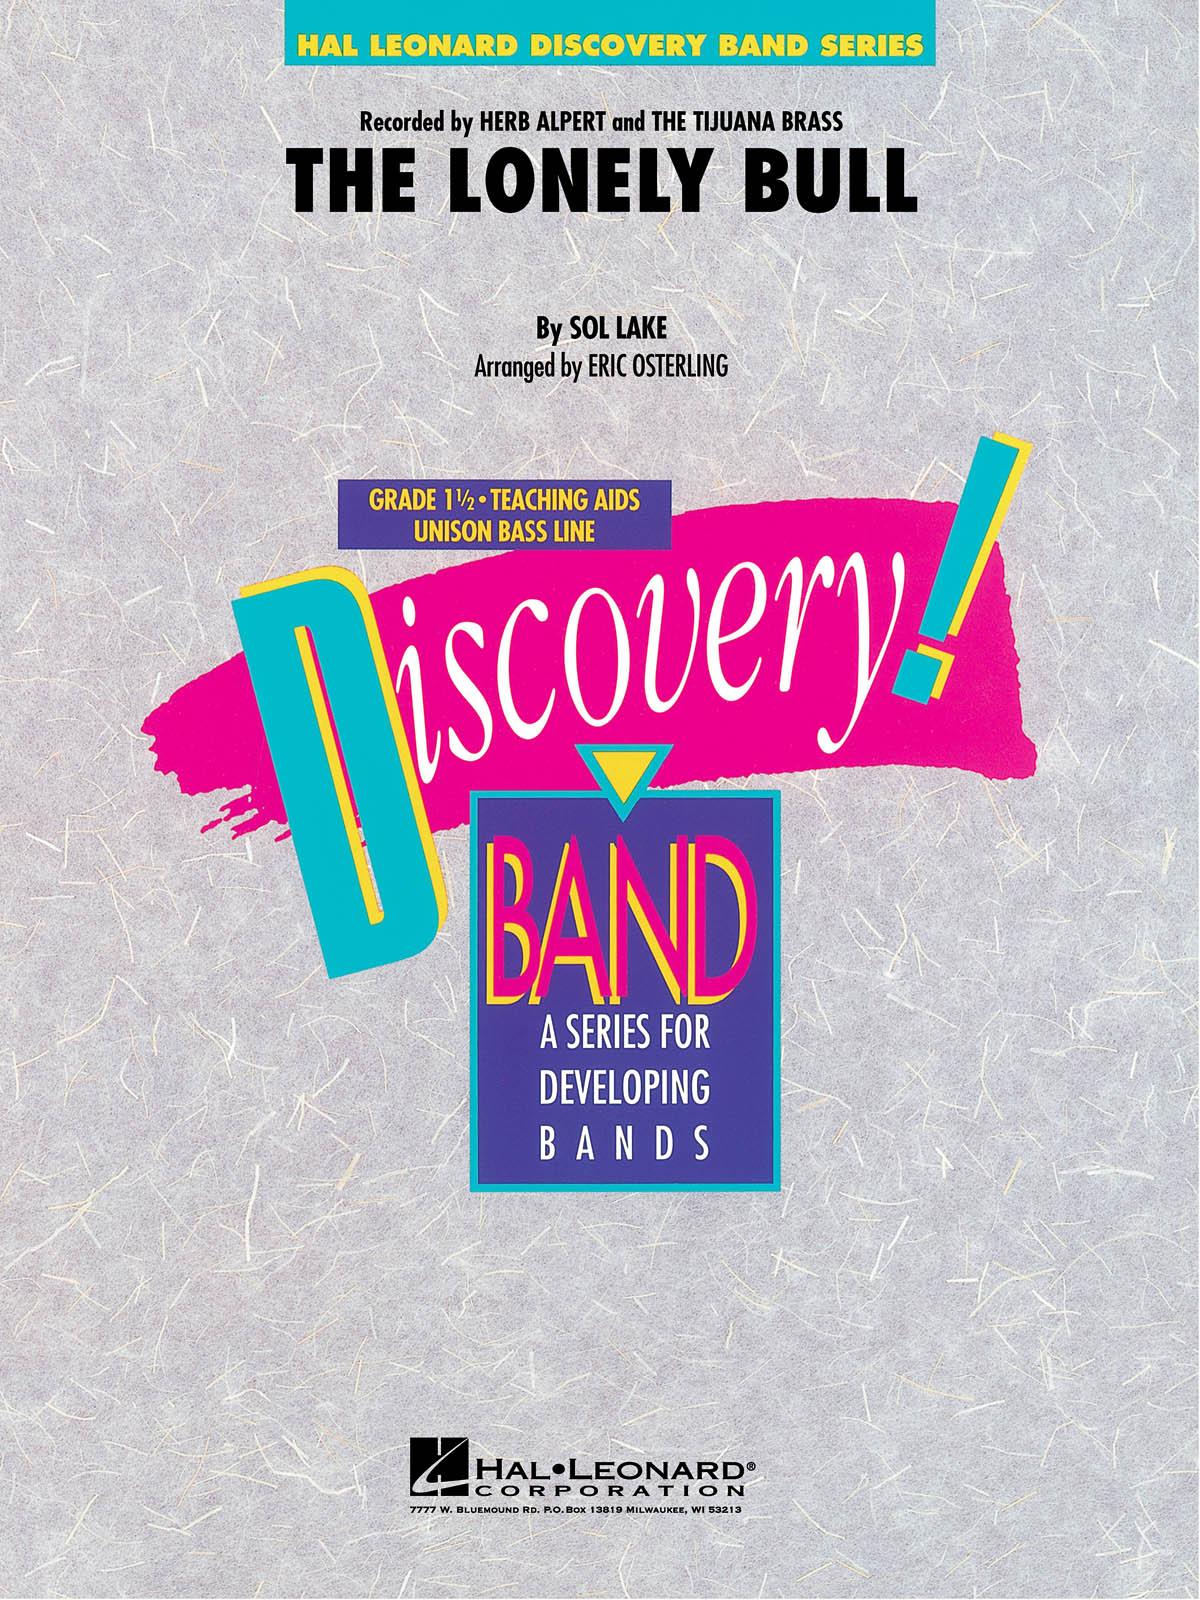 Herb Alpert: The Lonely Bull: Concert Band: Score